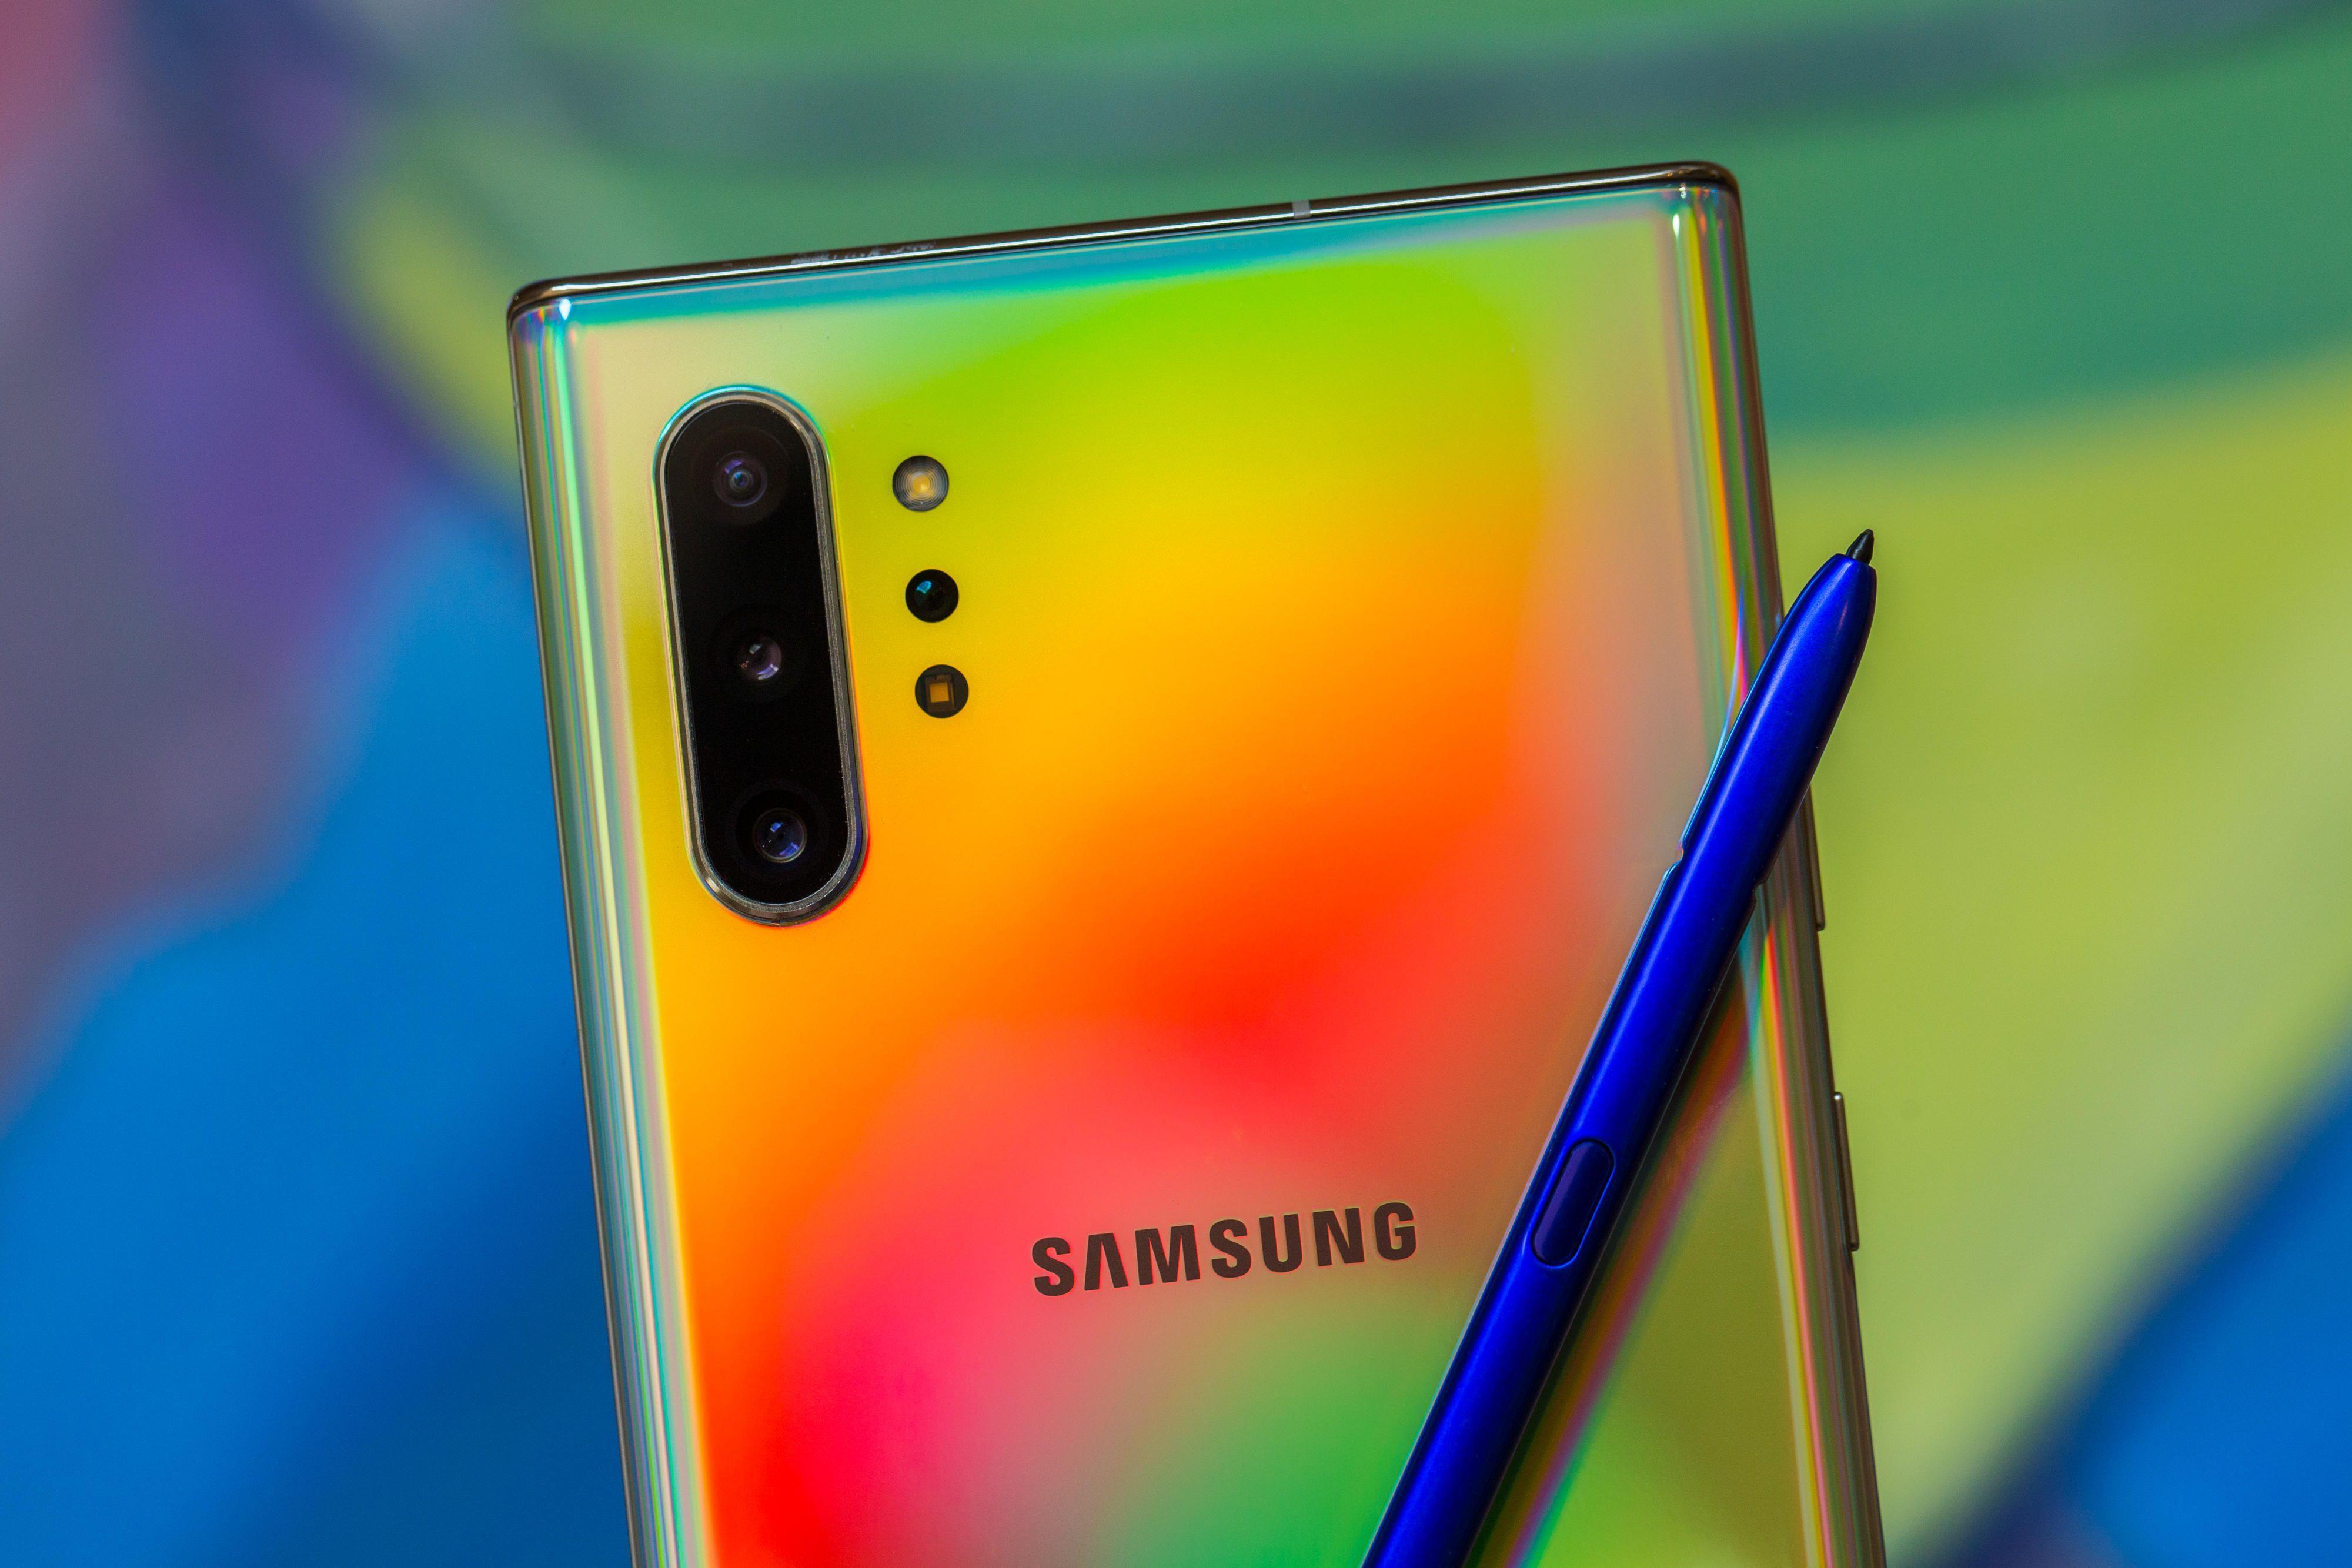 Galaxy Note 10+ Galaxy note 10, Galaxy note, Samsung